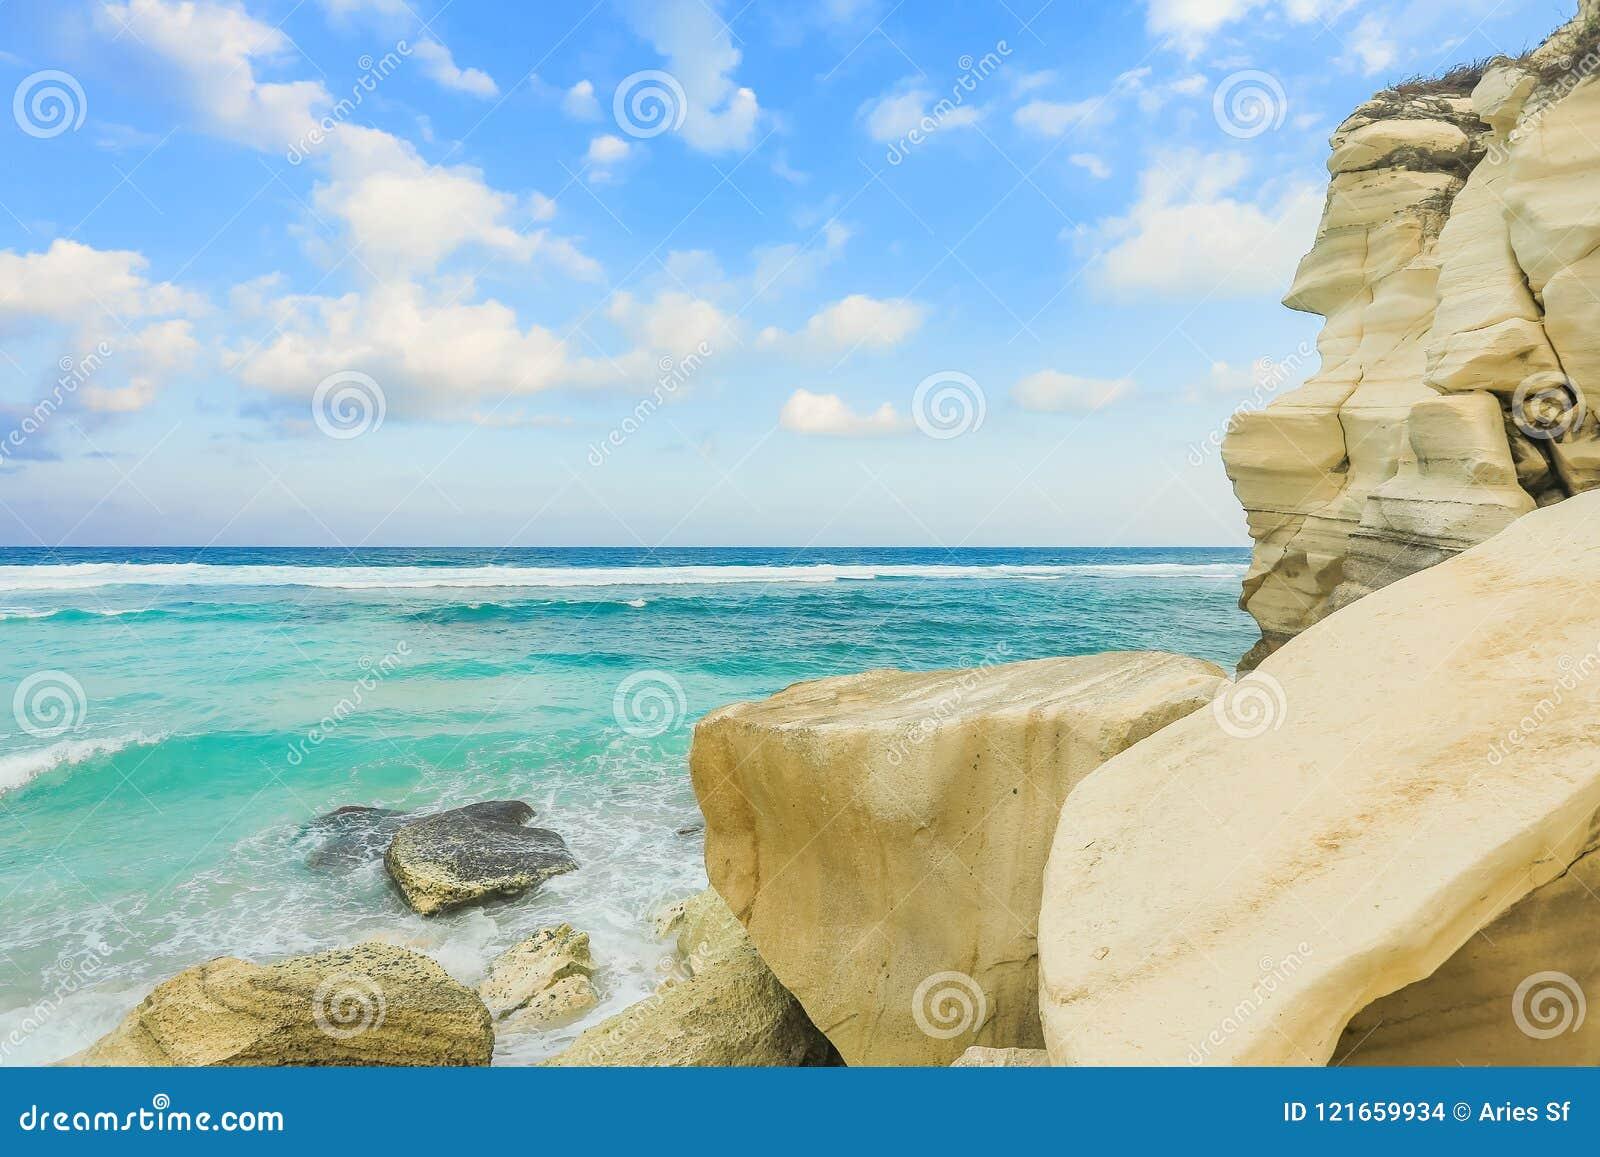 Beautiful Beach of Sumba Island